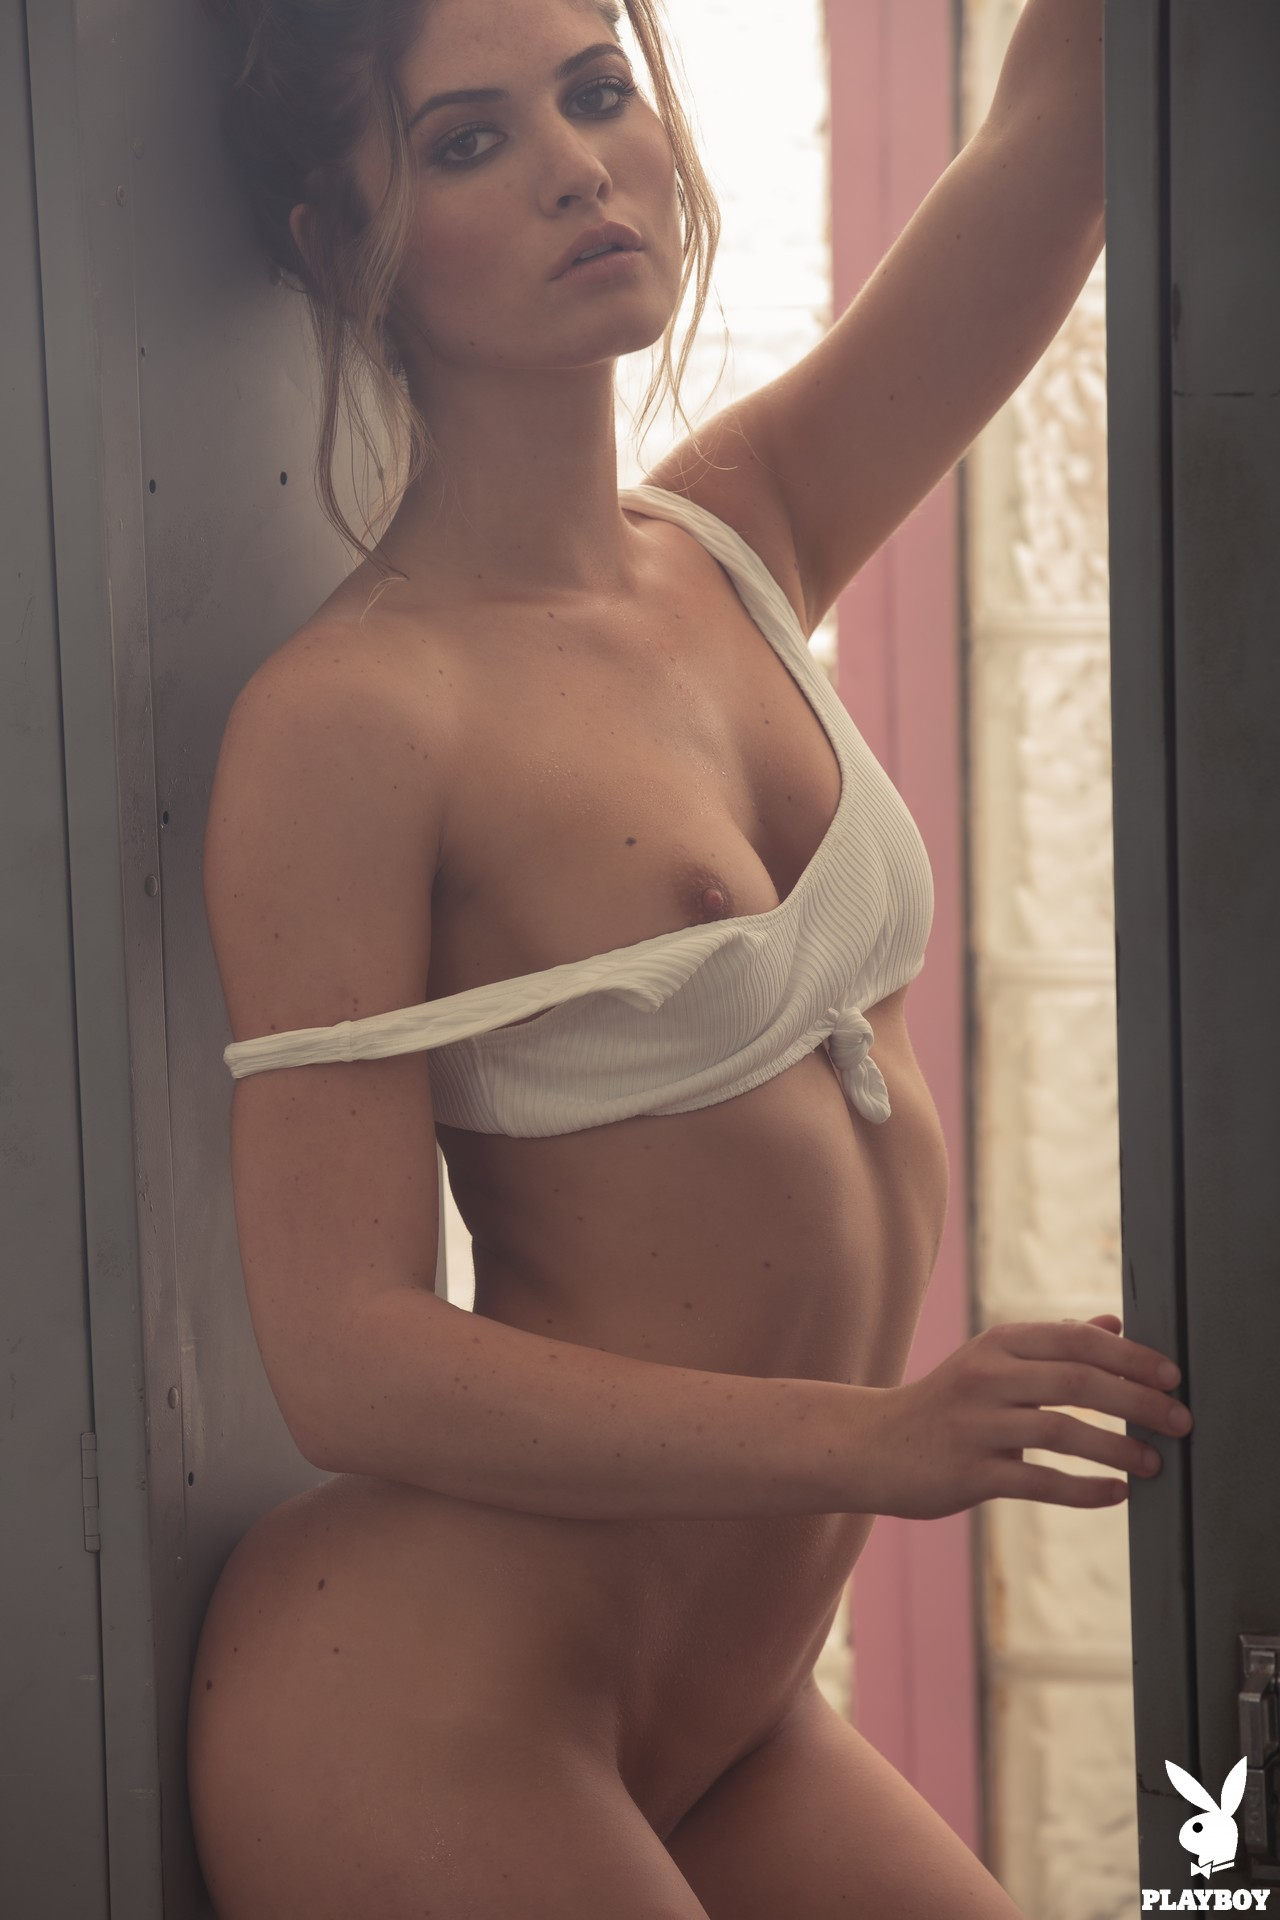 Playmate May 2018: Shauna Sexton - Playboy Plus 15